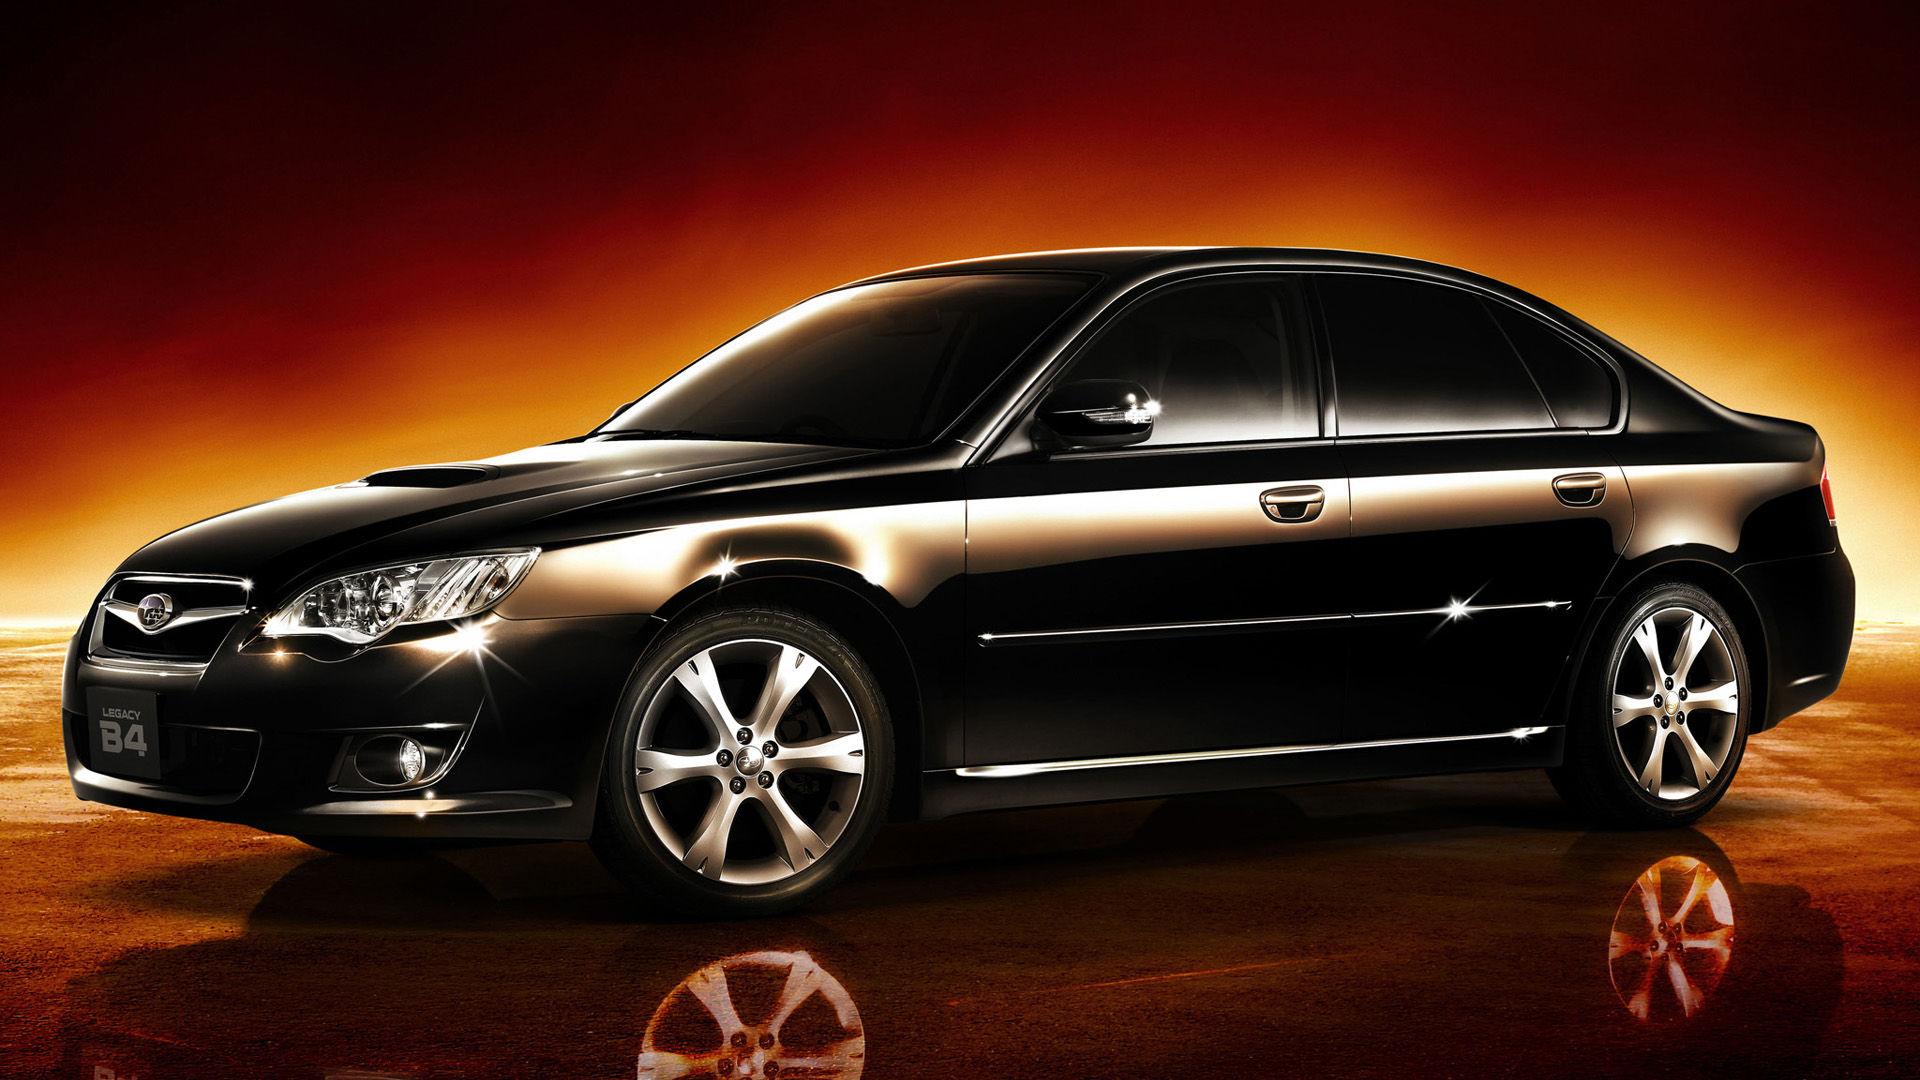 2006 Subaru Legacy B4